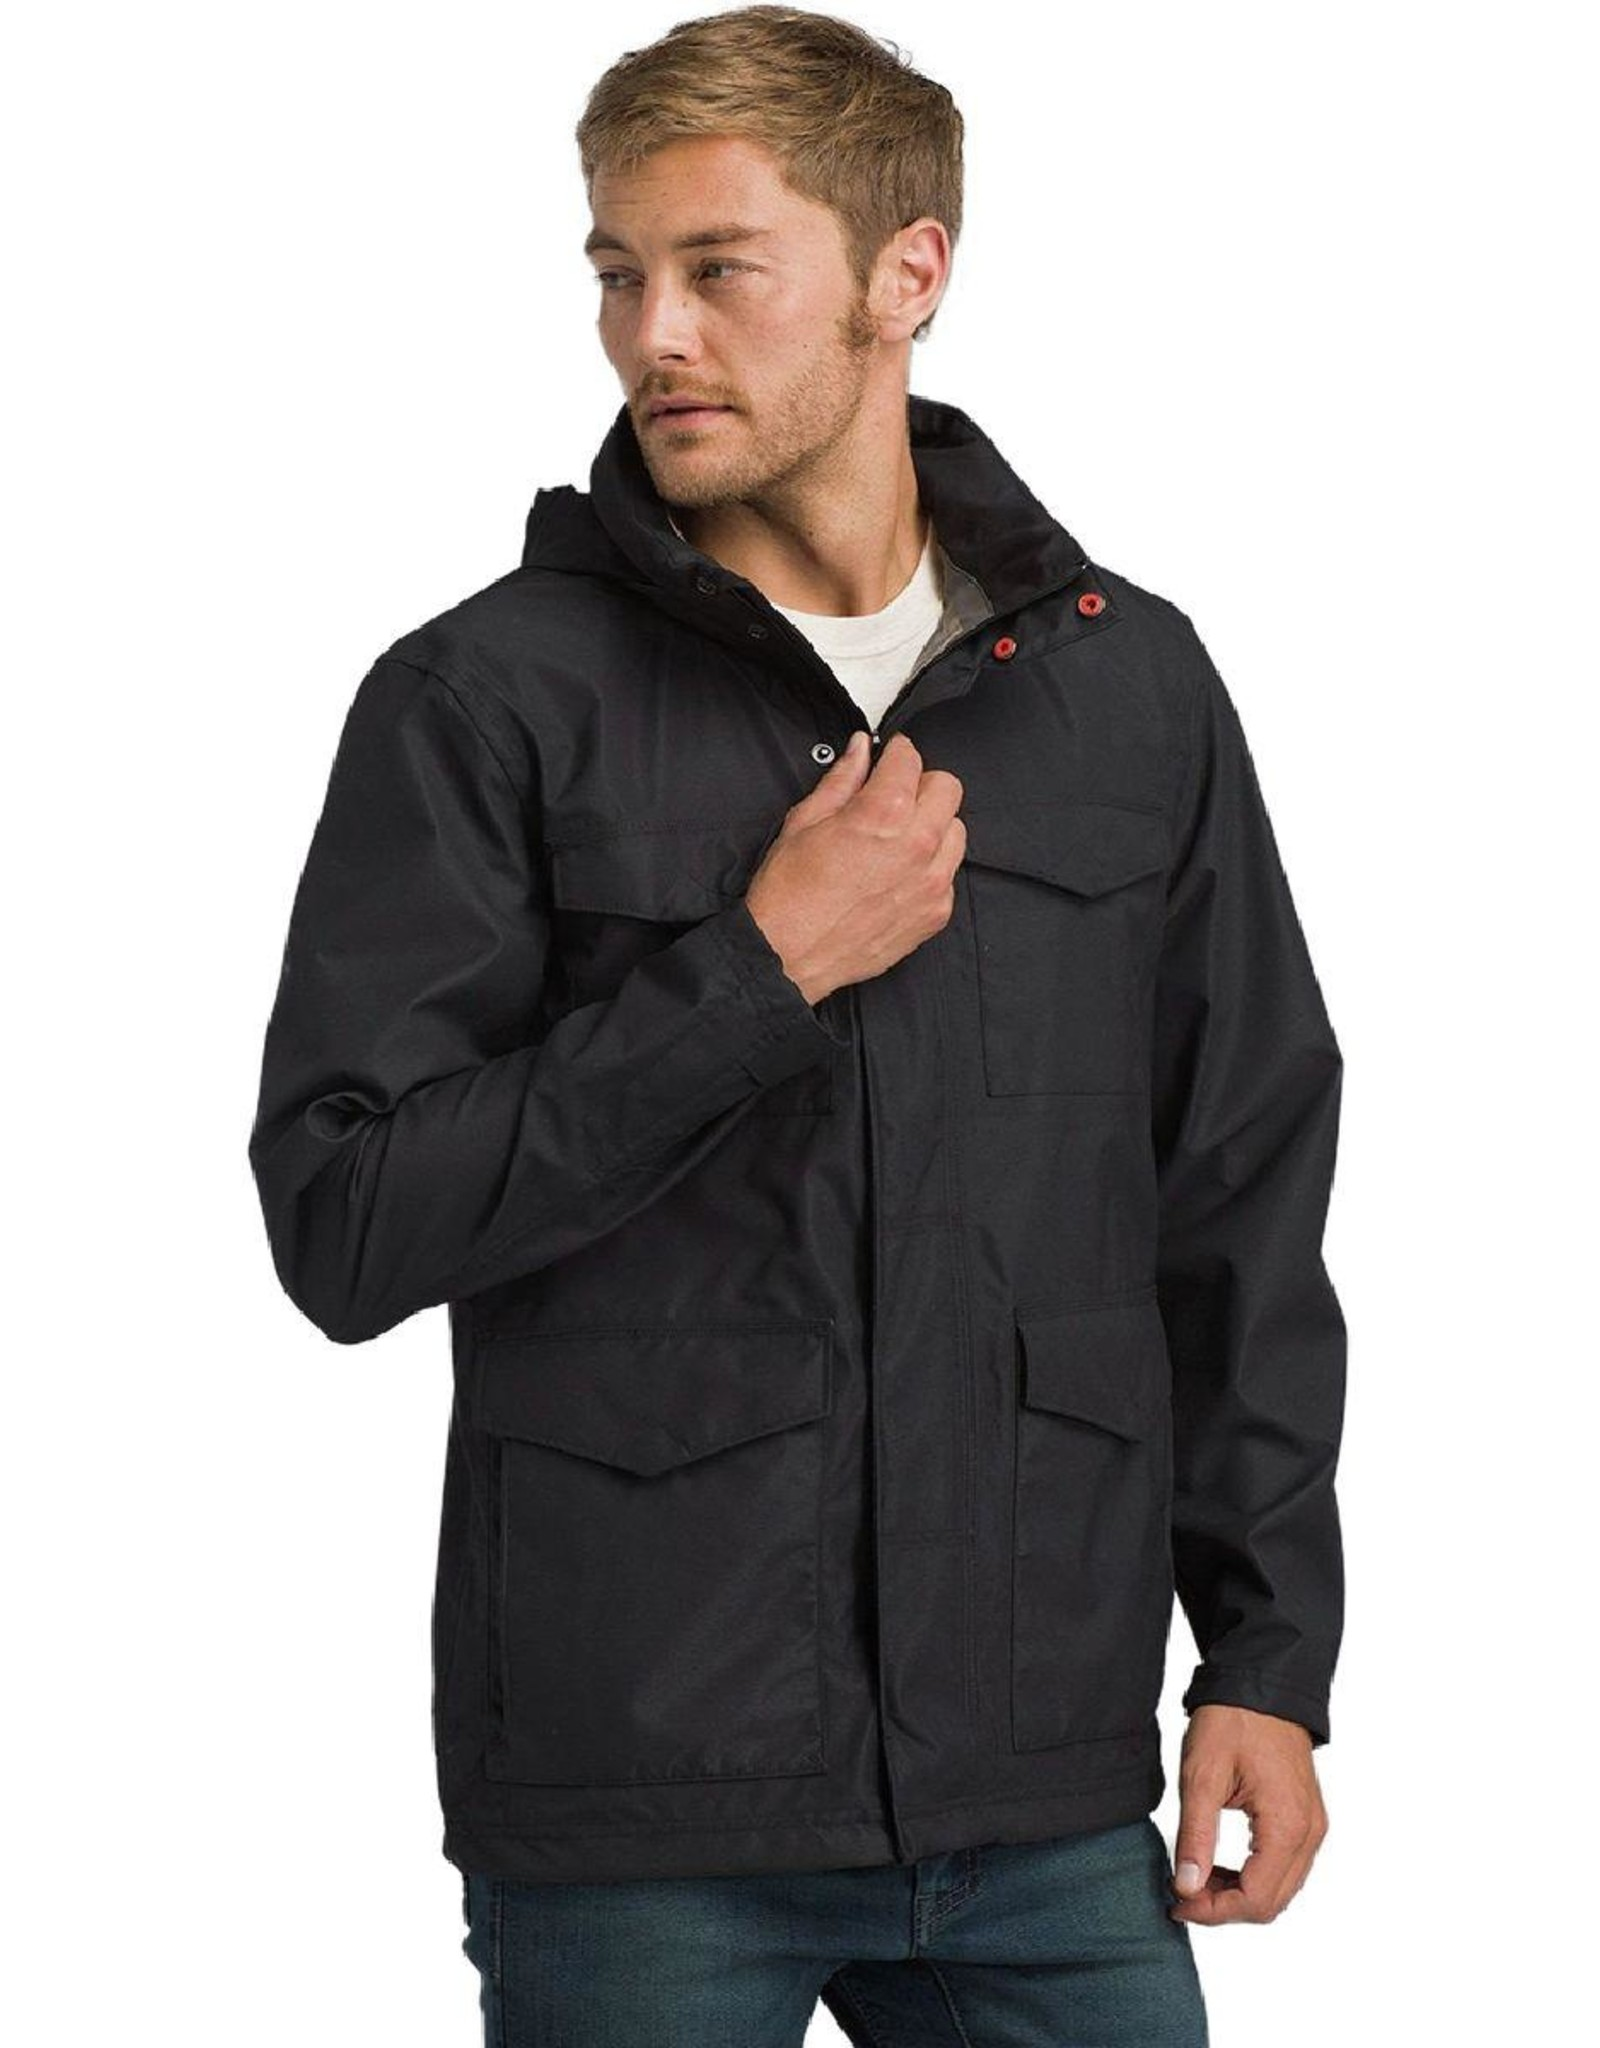 Prana M-65 jacket